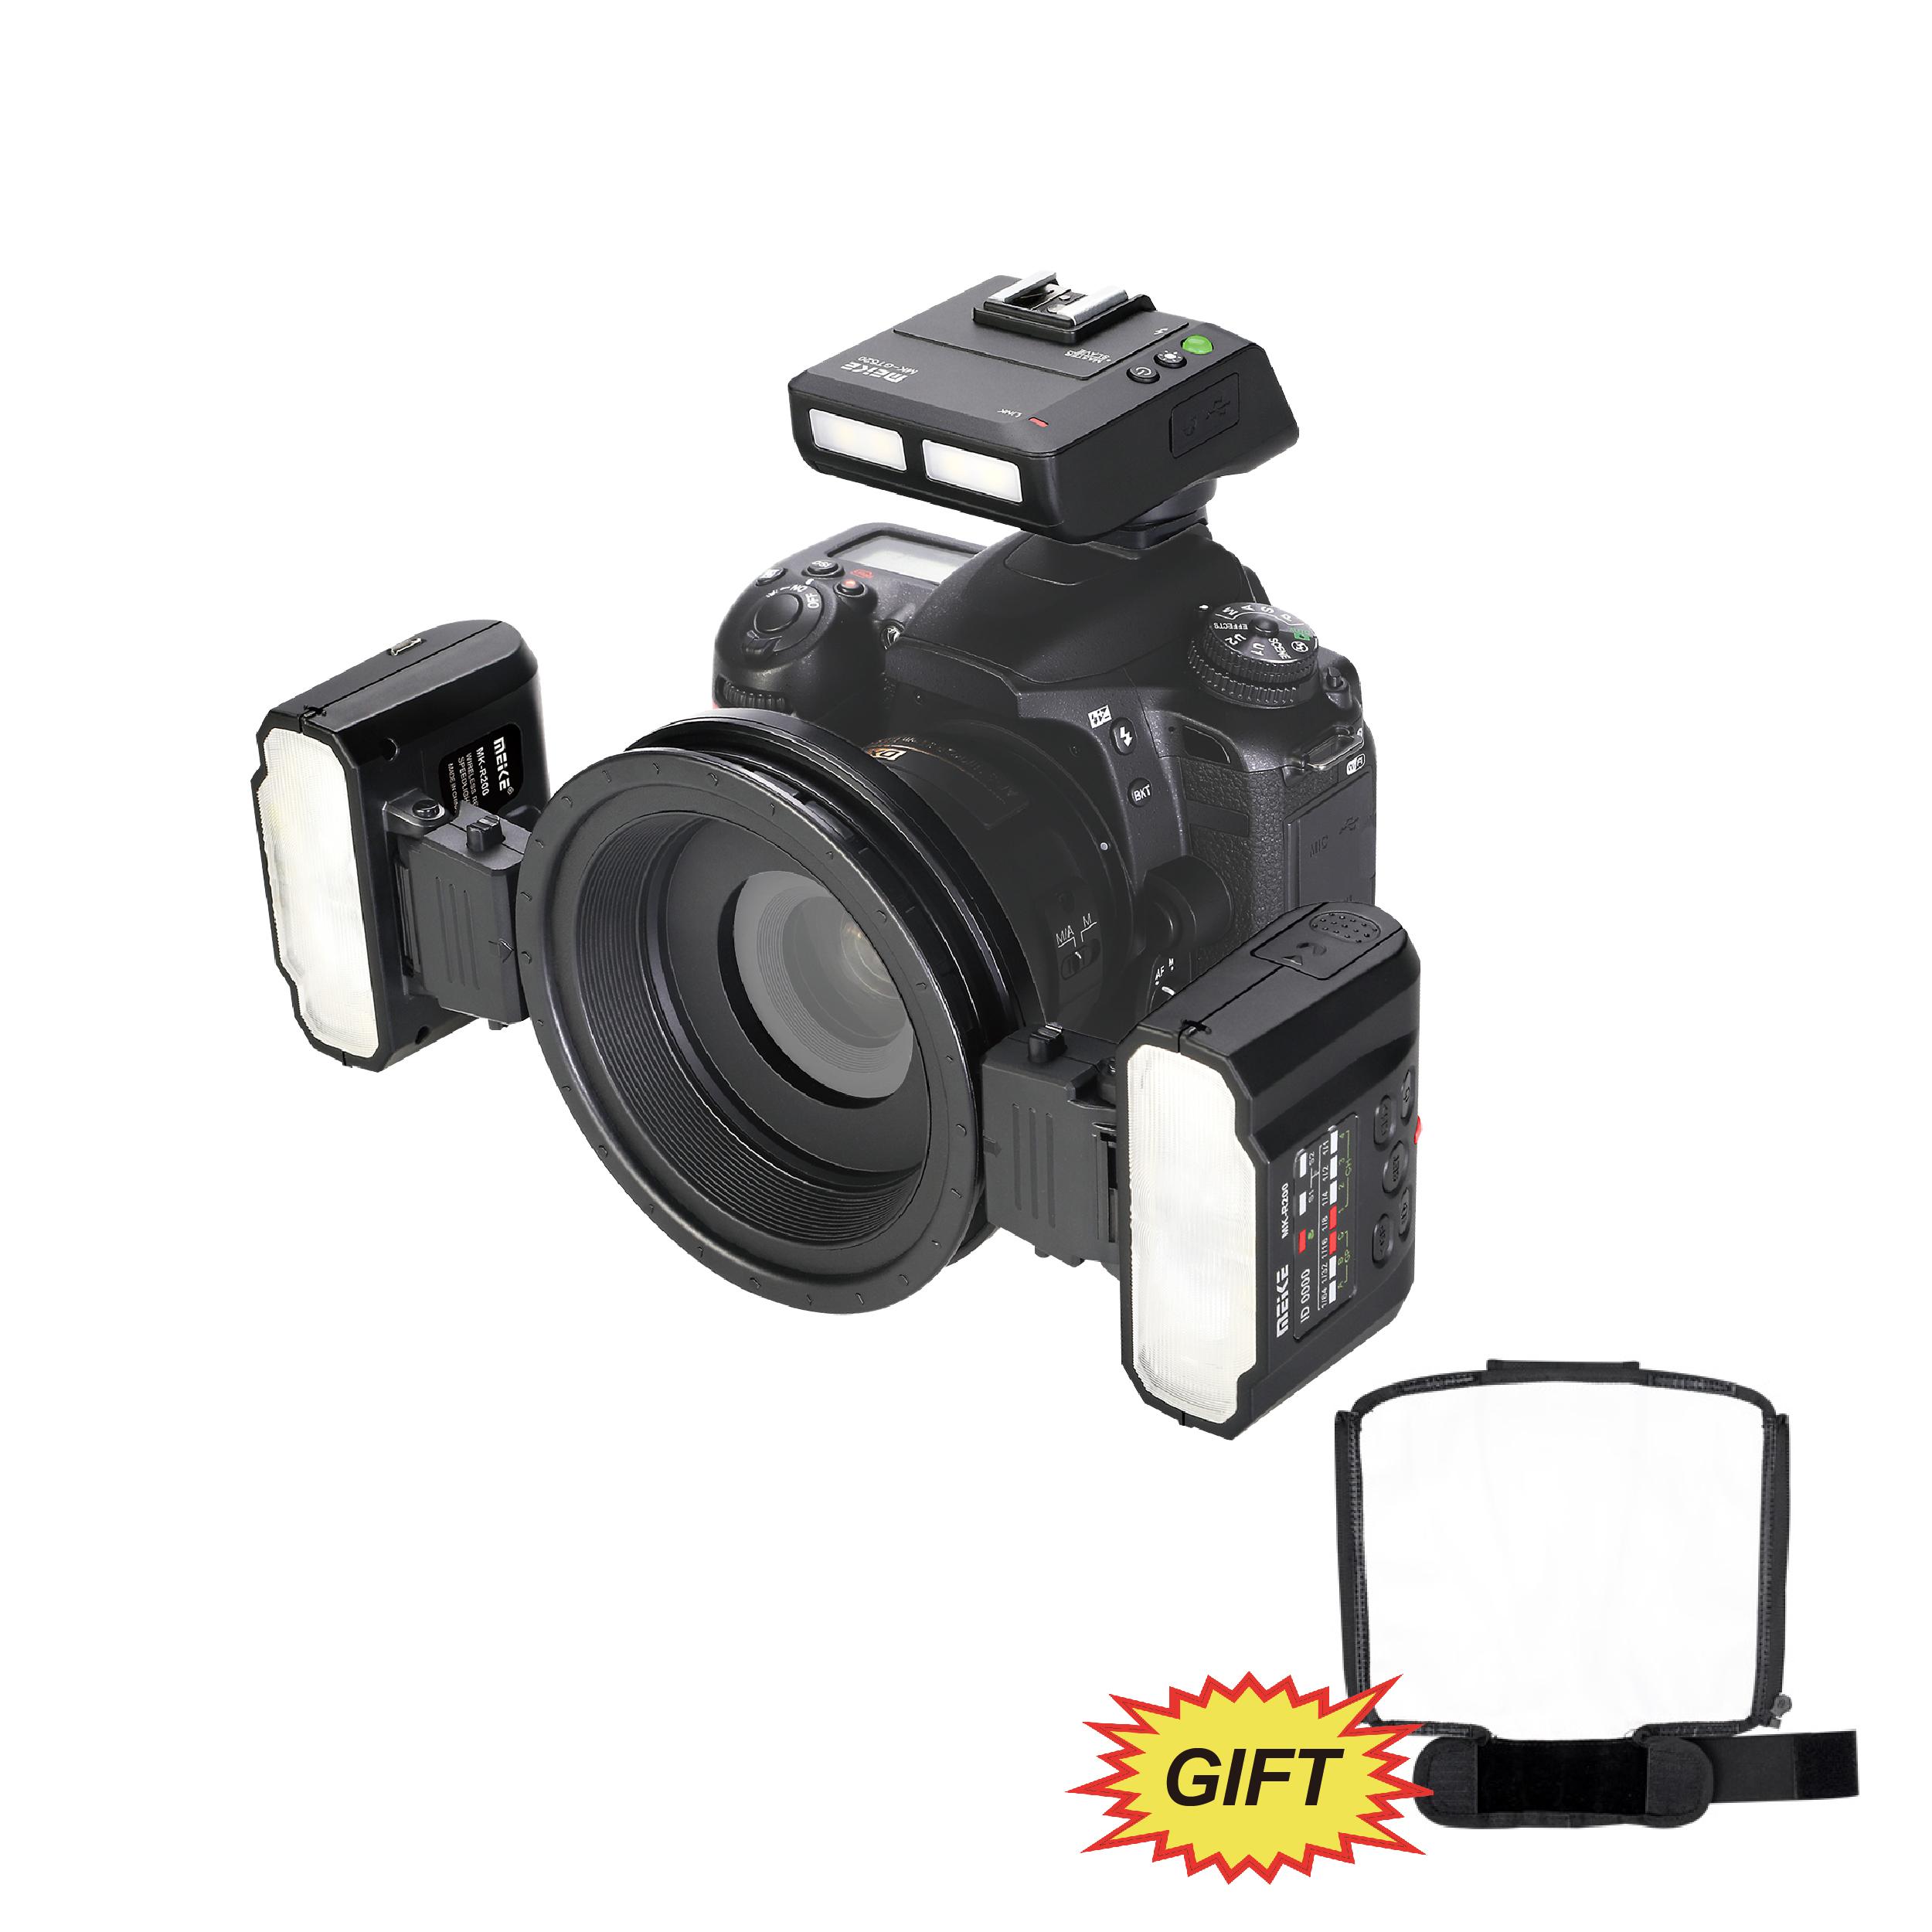 MEKE Meike MK-MT24 Macro Twin Lite Speedlight Flash for Canon DSLR Camera 70D 60D 760D 750D 550D 450D 1200D 5D 6D EOS M3+GIFT